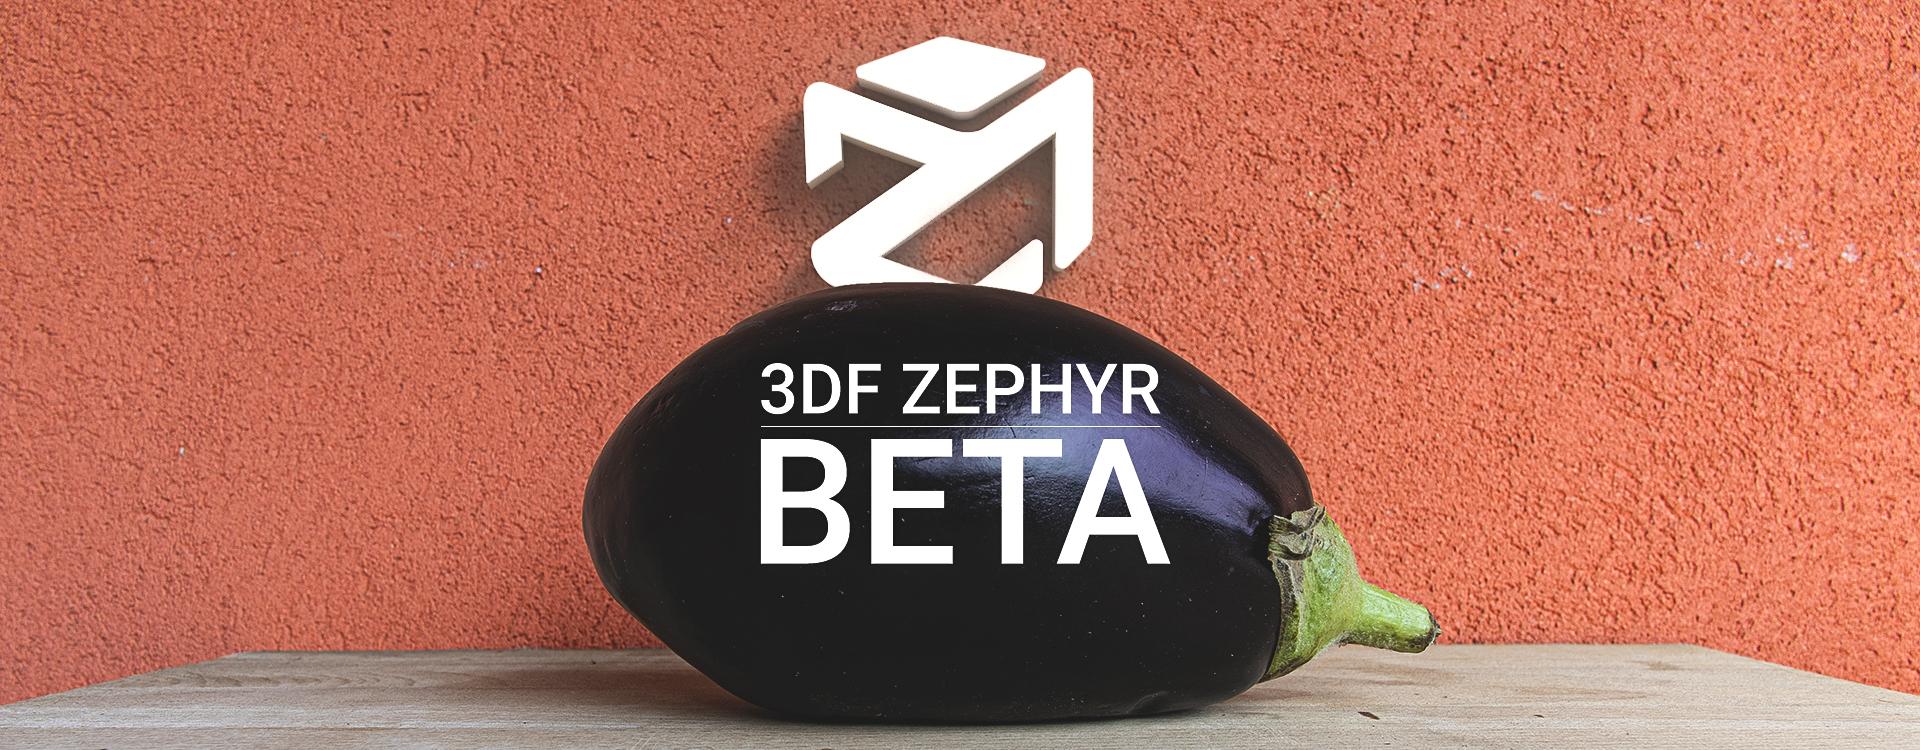 3df_zephyr_beta_6